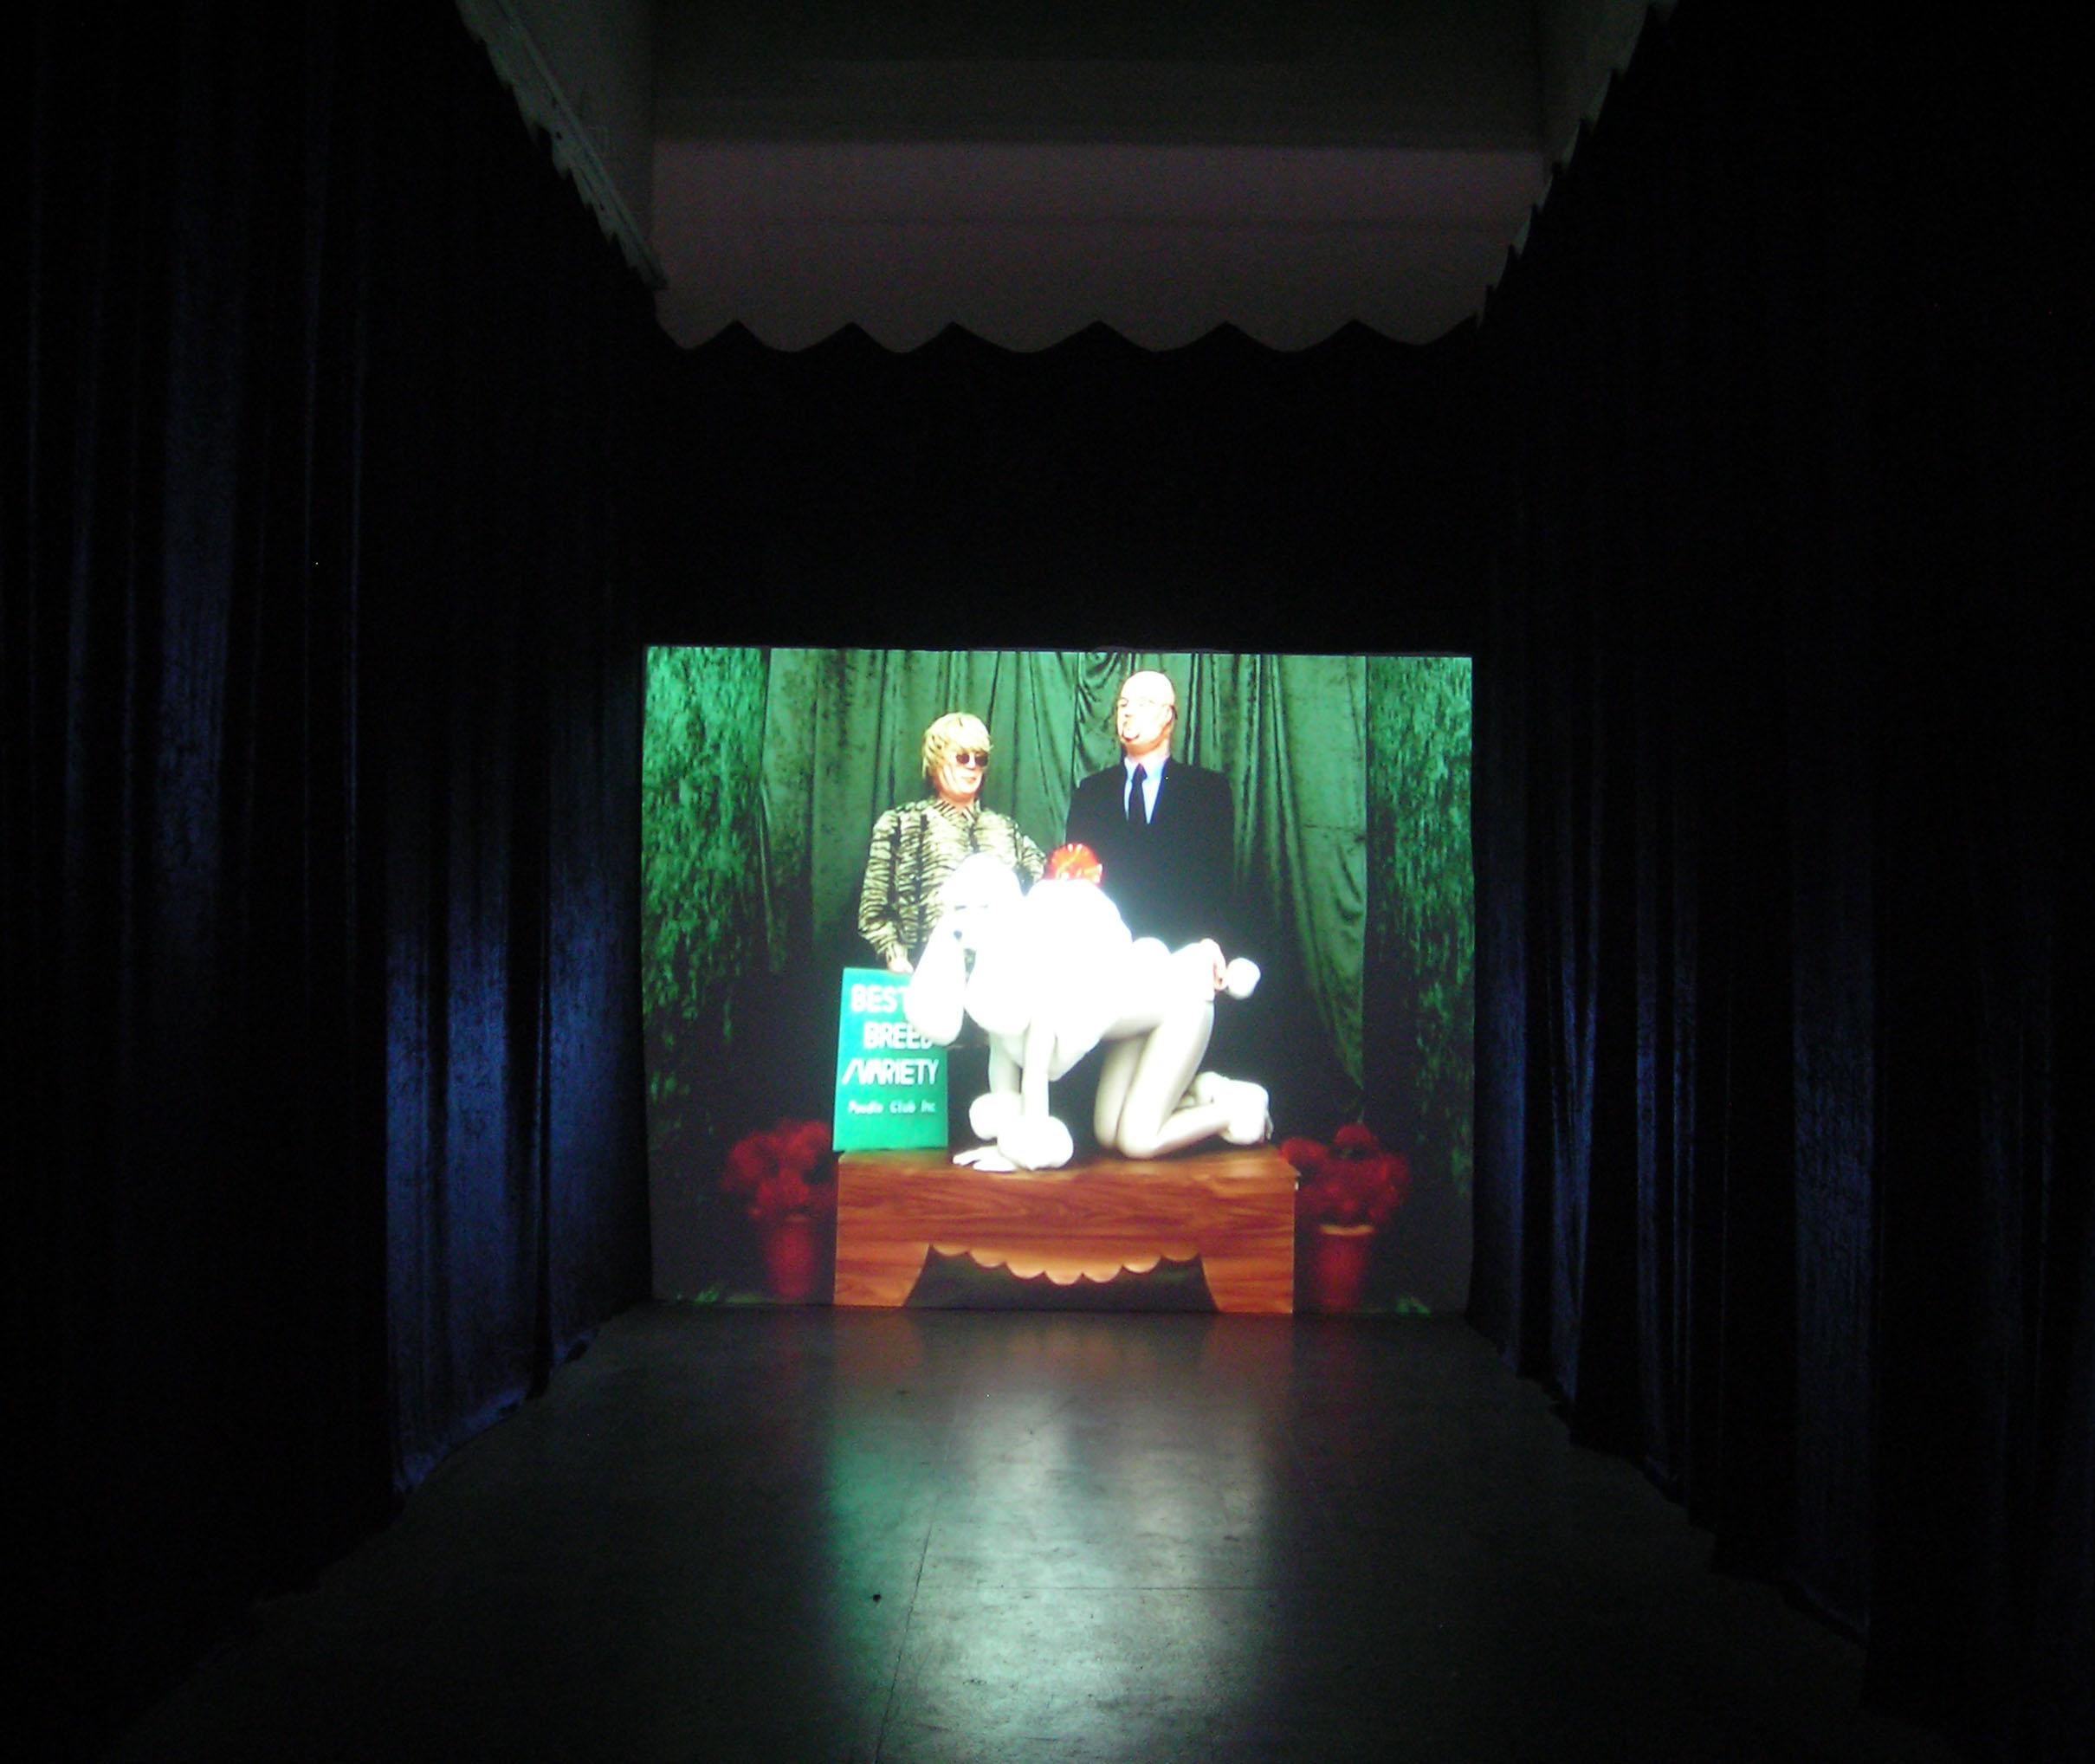 Installation at The Fridge Gallery, 2007 Southside Studios, Glasgow, UK